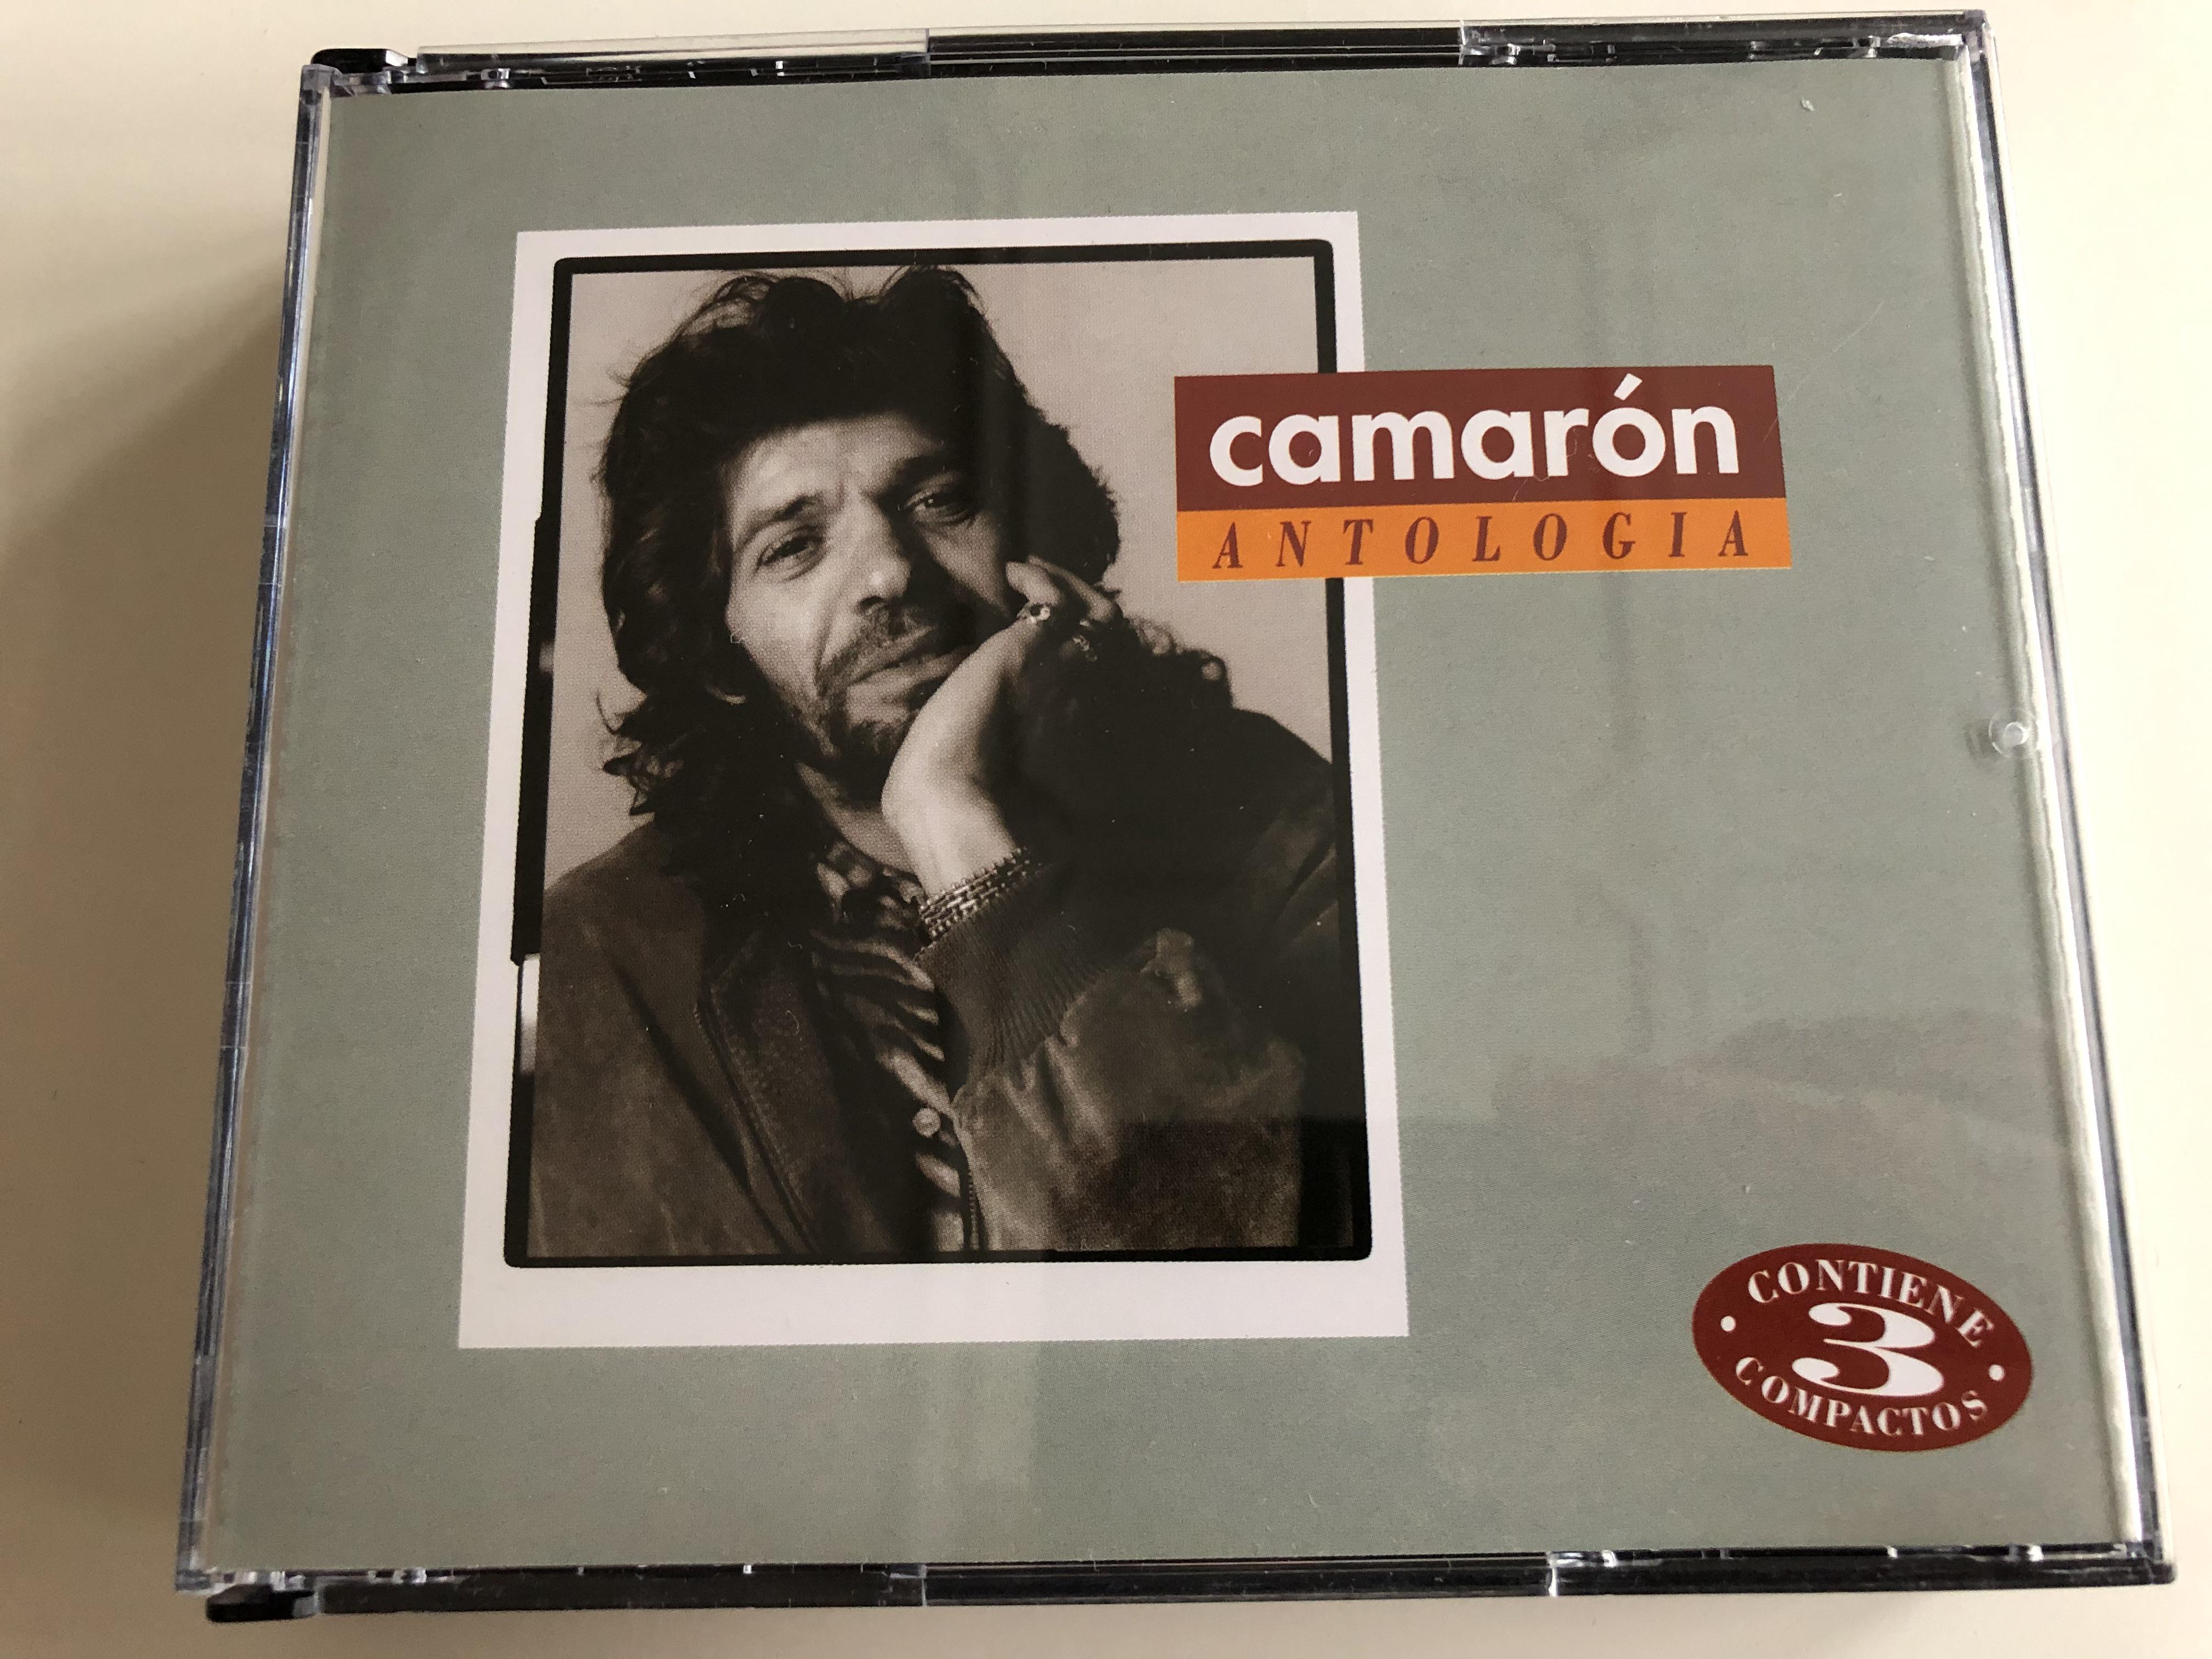 camar-n-antologia-anthology-3-audio-cd-set-1996-vol-1-3.-fundamentos-grandeza-apoetosis-polygram-1-.jpg